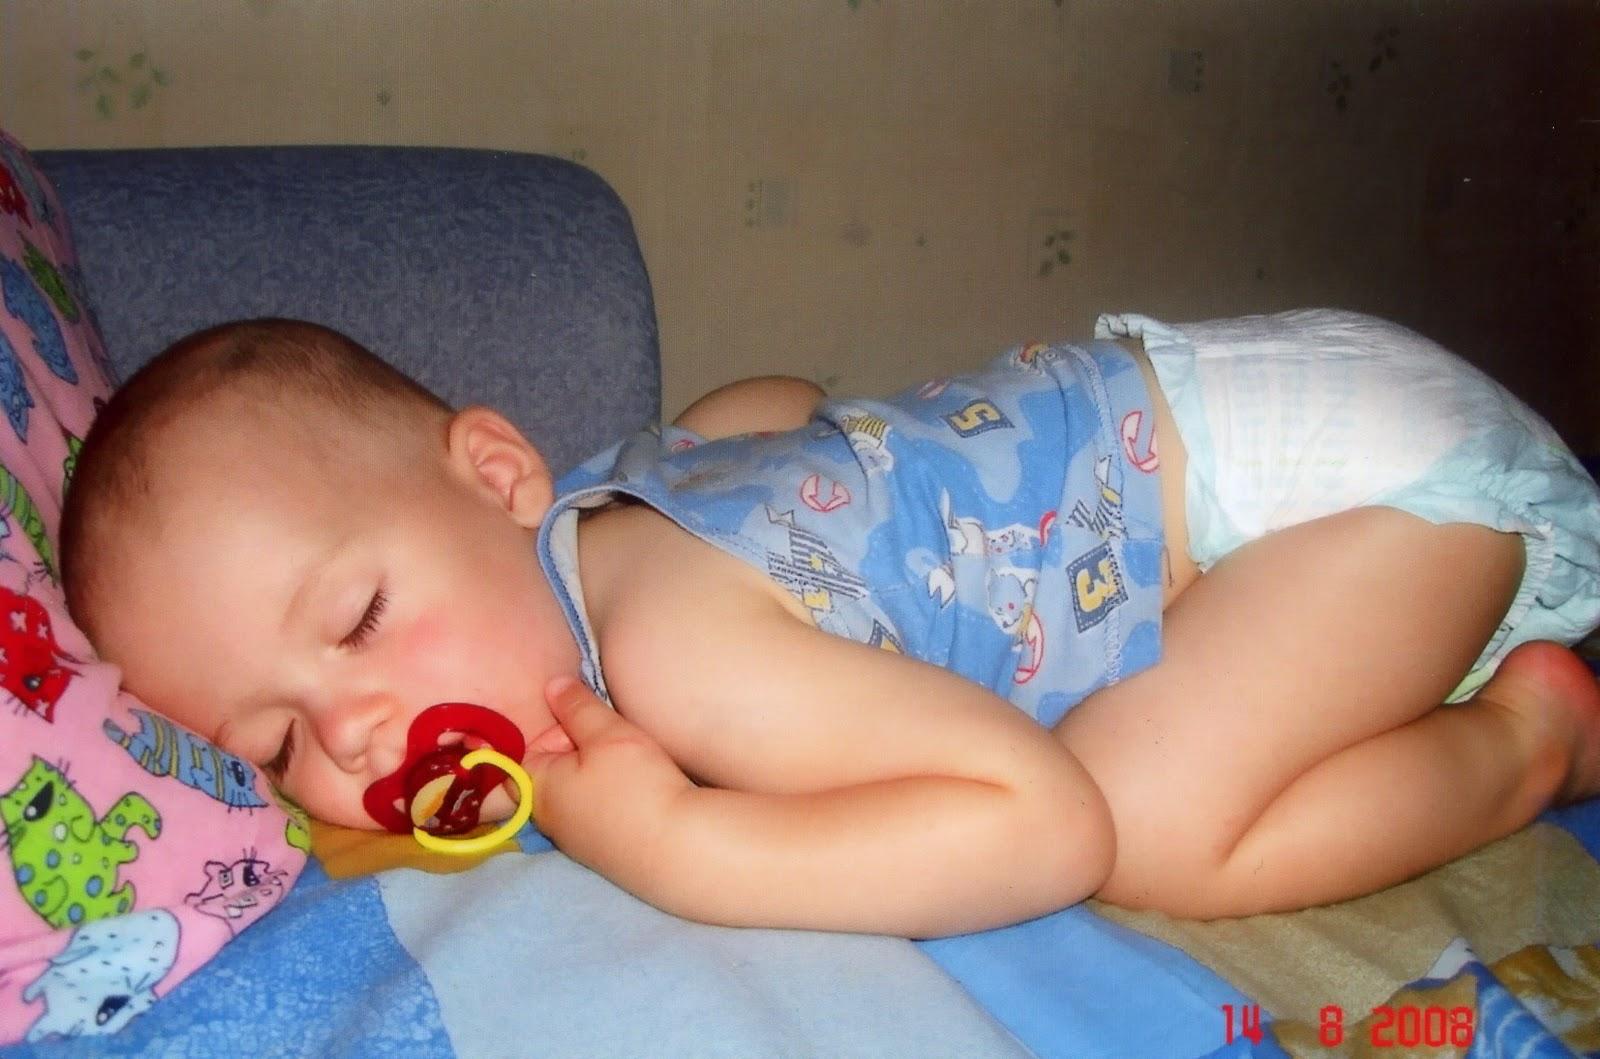 Стул ребенка в месяц при грудном вскармливании фото норма